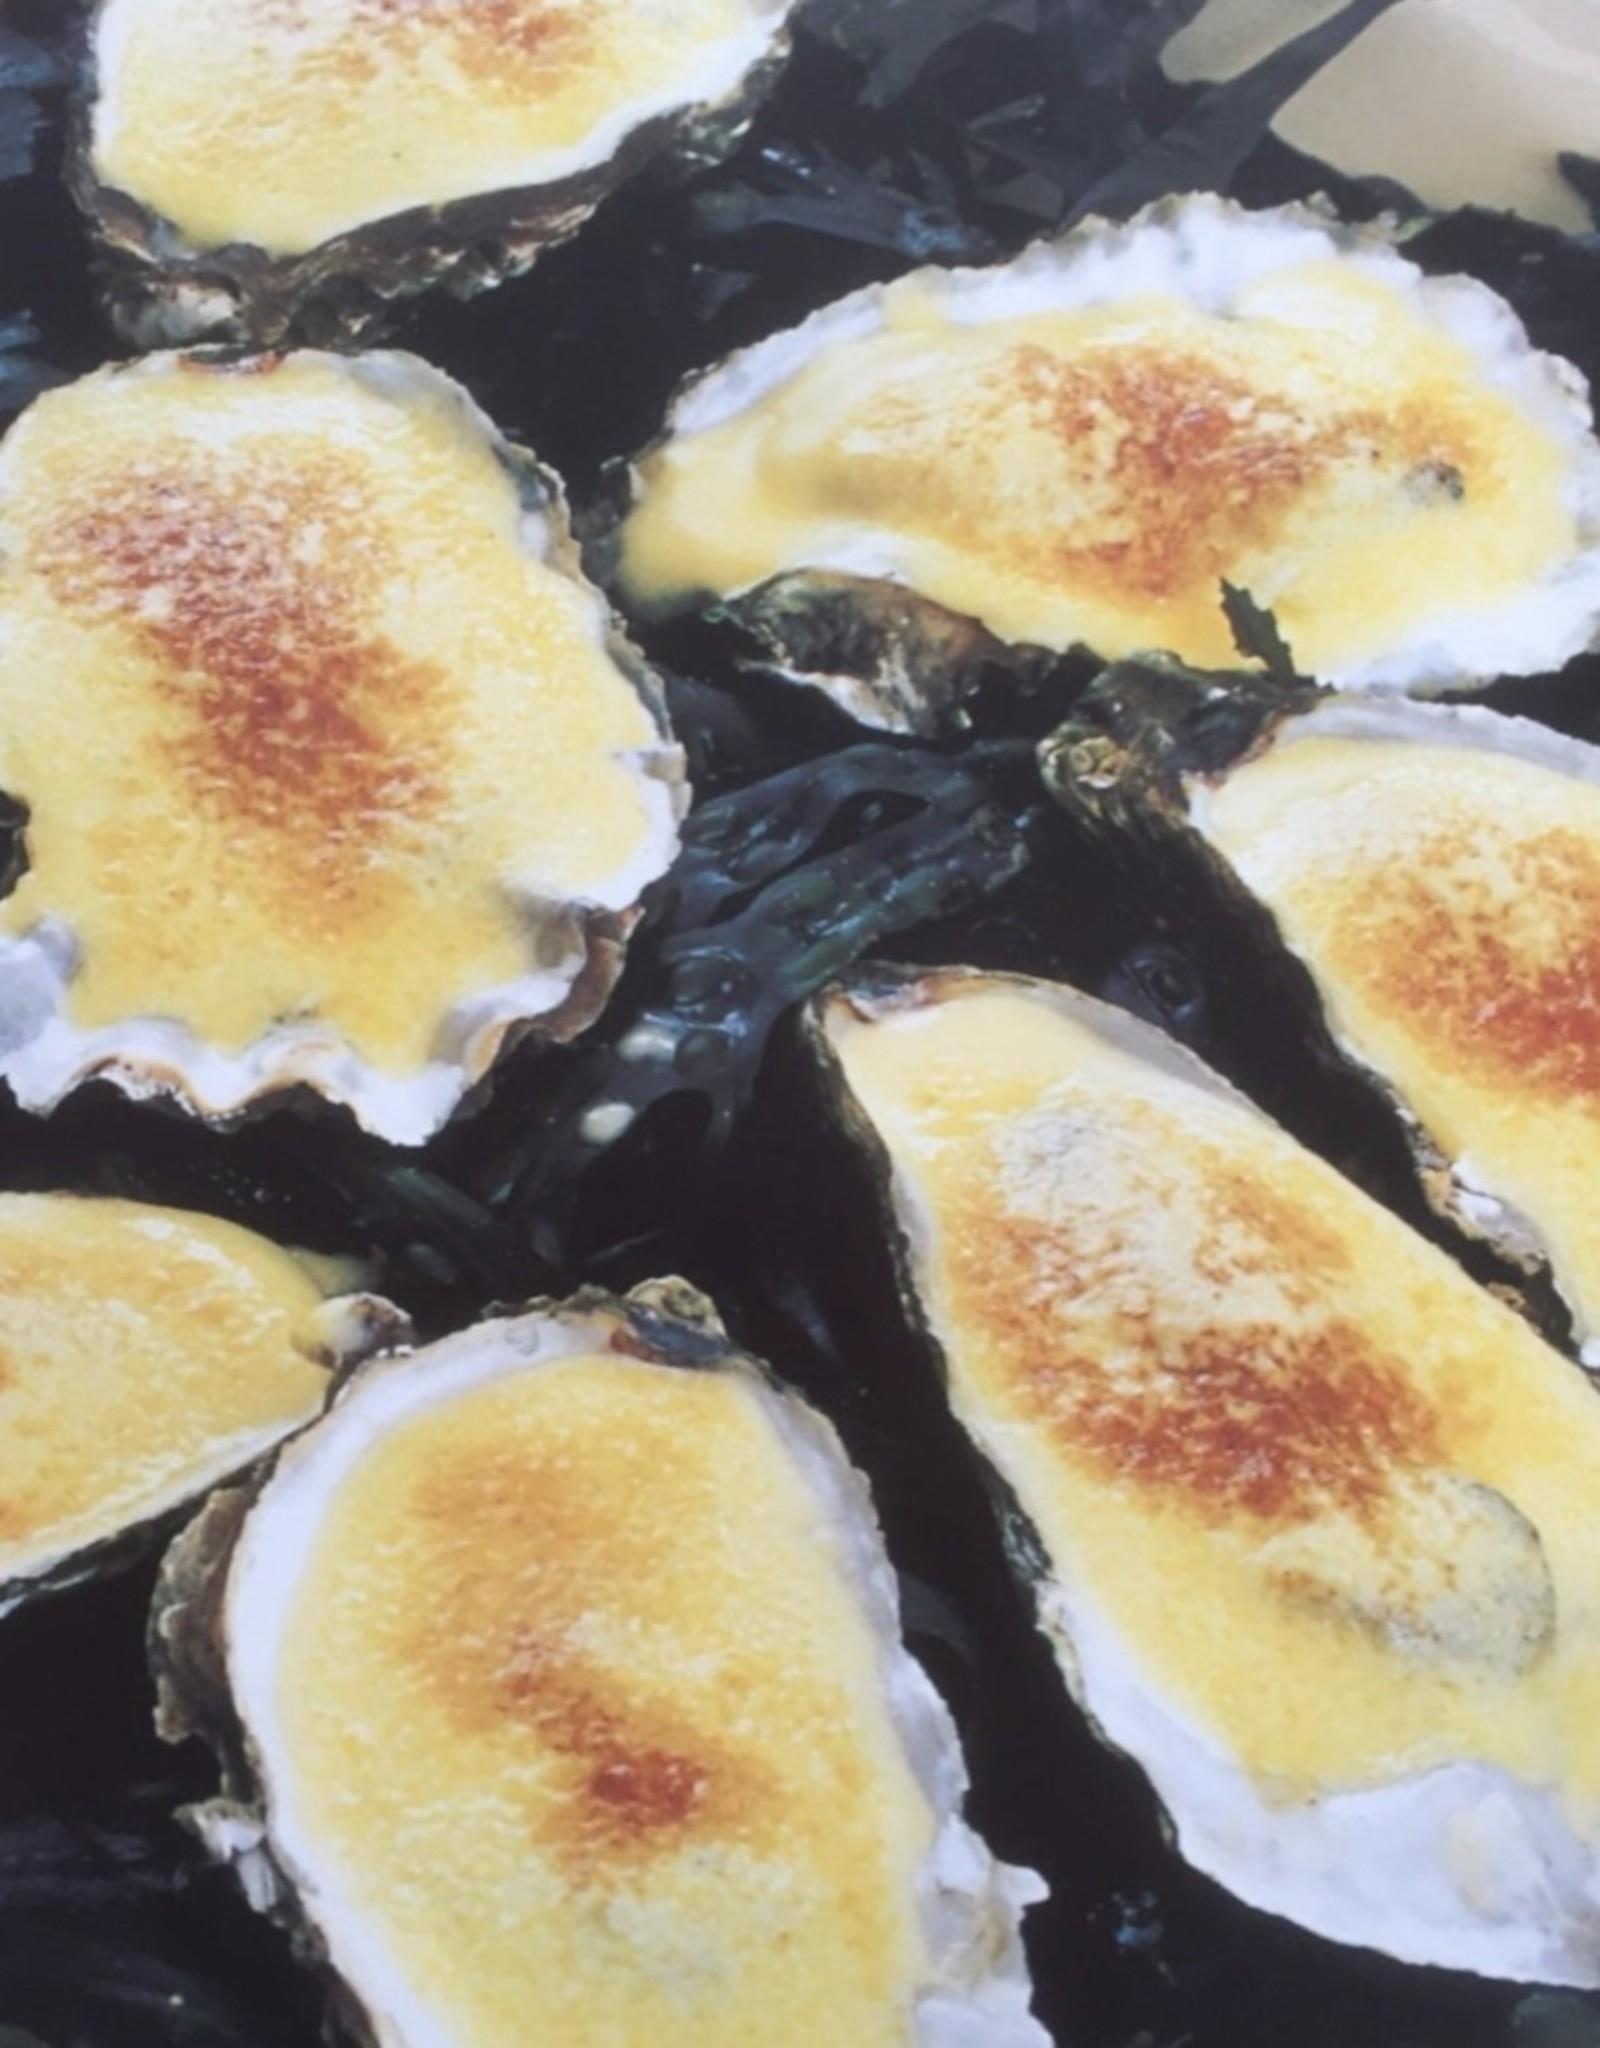 3 st diepe oesters  gegratineerd met spinazie en champagnesaus  3 st